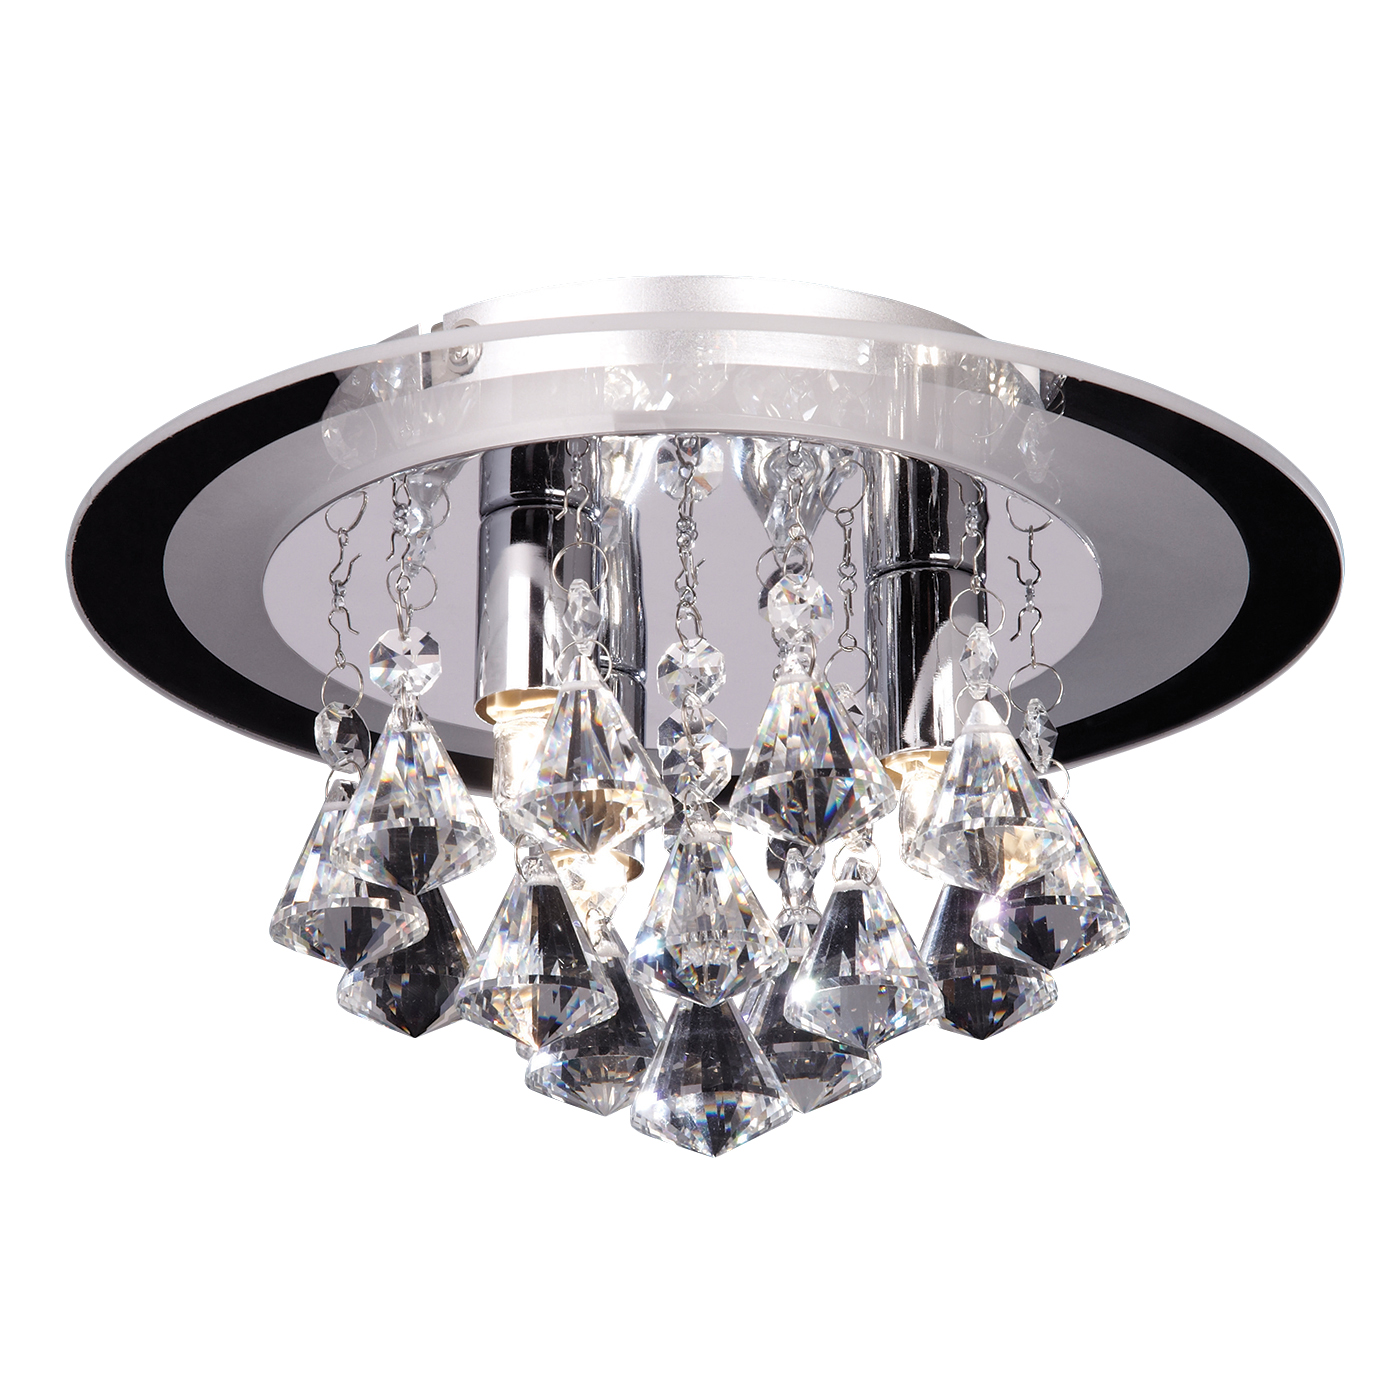 Endon RENNER-3CH Ceiling Light G9 3x33W